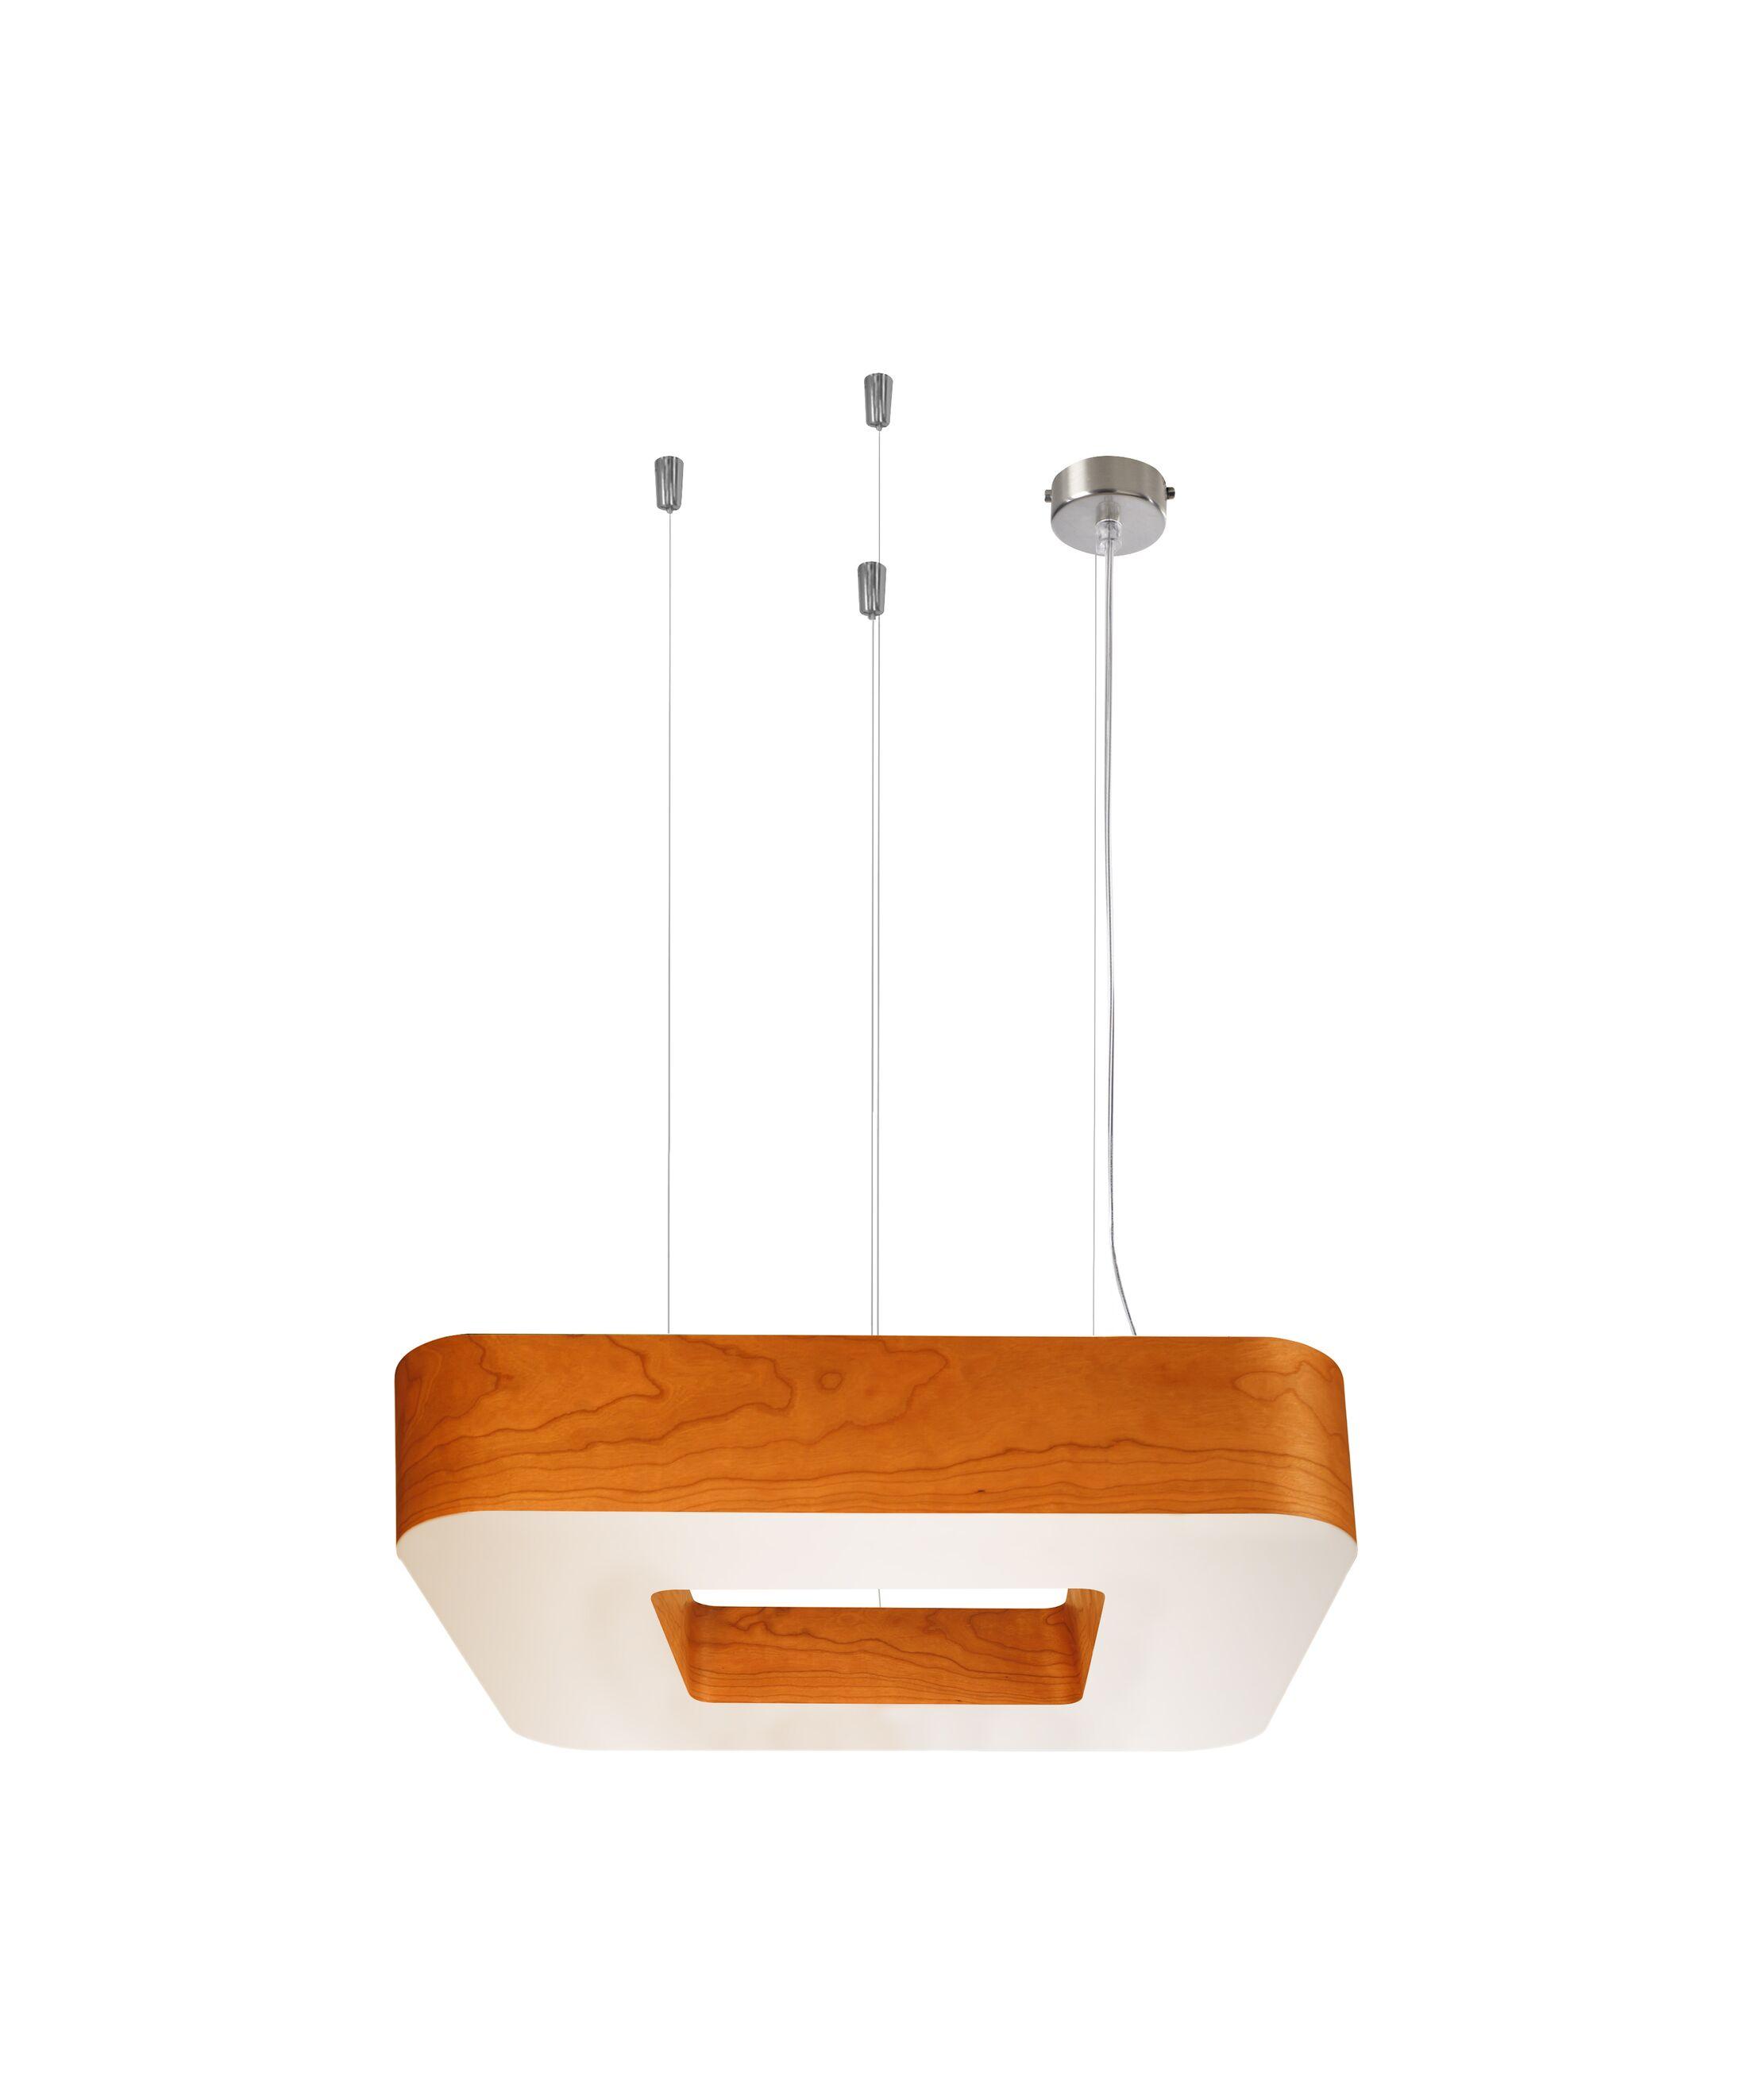 Cuad Club 4-Light Square/Rectangle Chandelier Ballast: Multivolt, Size: Medium, Finish: Orange